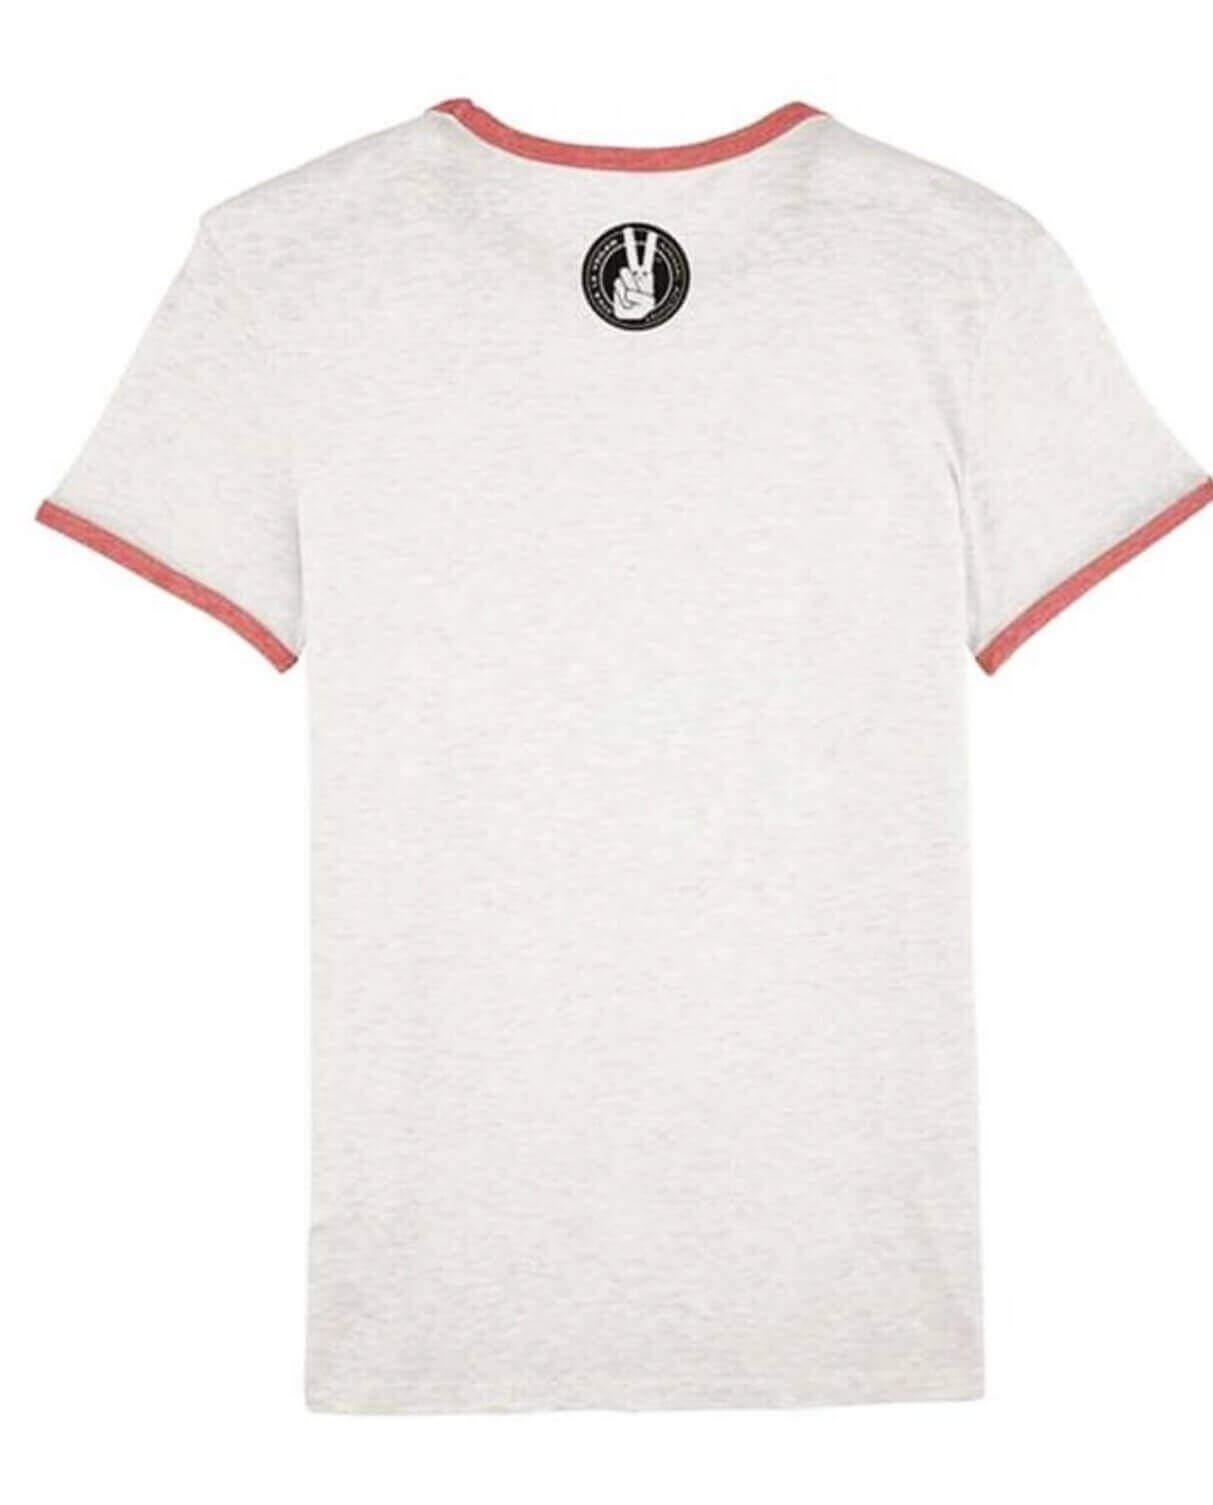 Women's Tshirt: Animal Liberation WHITE